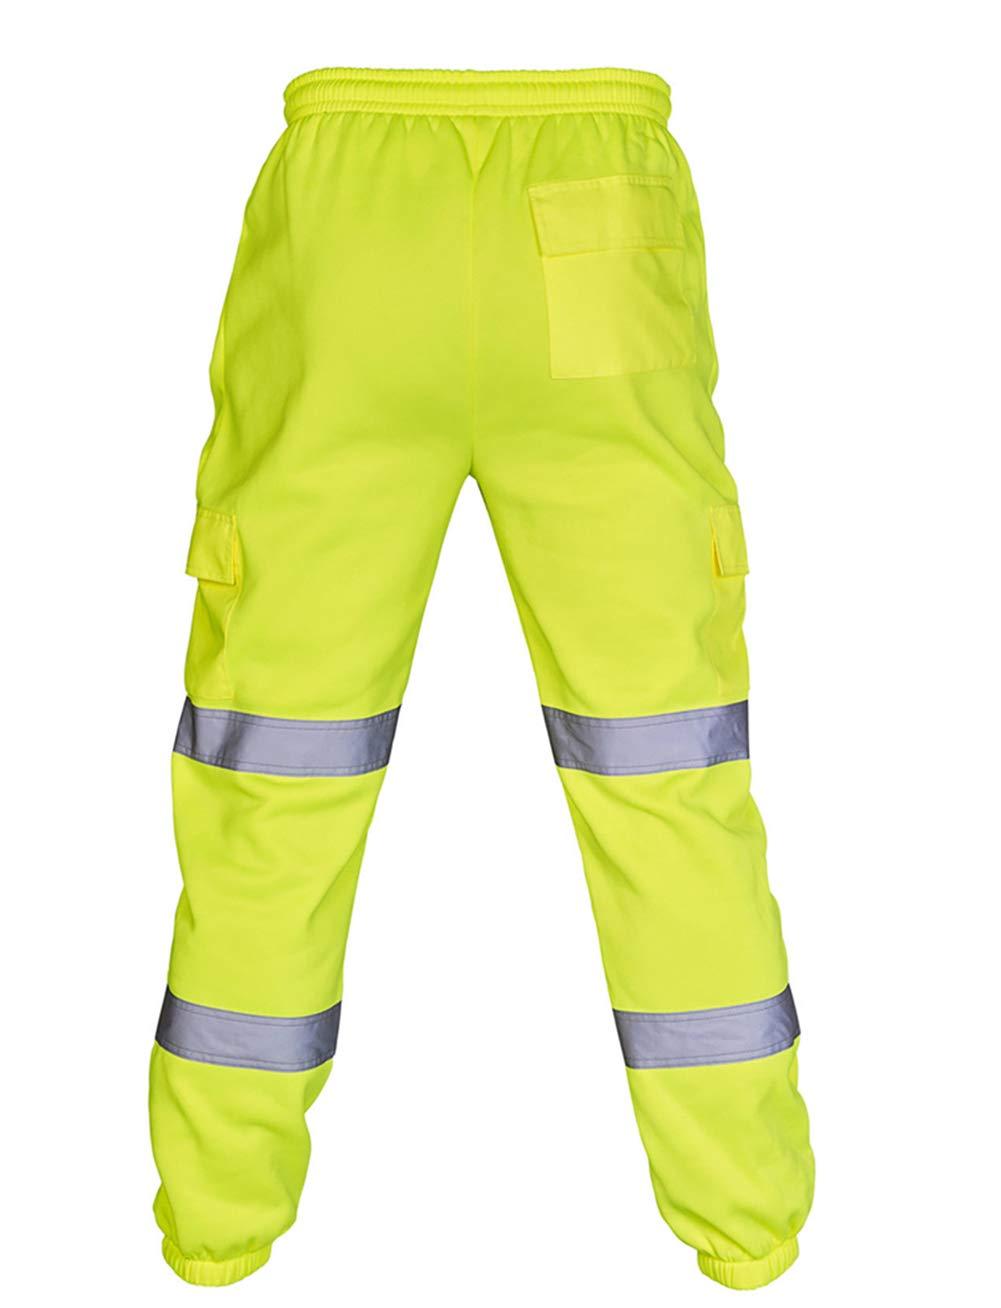 L, Yellow Mens Hi Vis Viz Reflective Overalls High Visibility Safe Work Pants Sweatpants Joggers Trousers